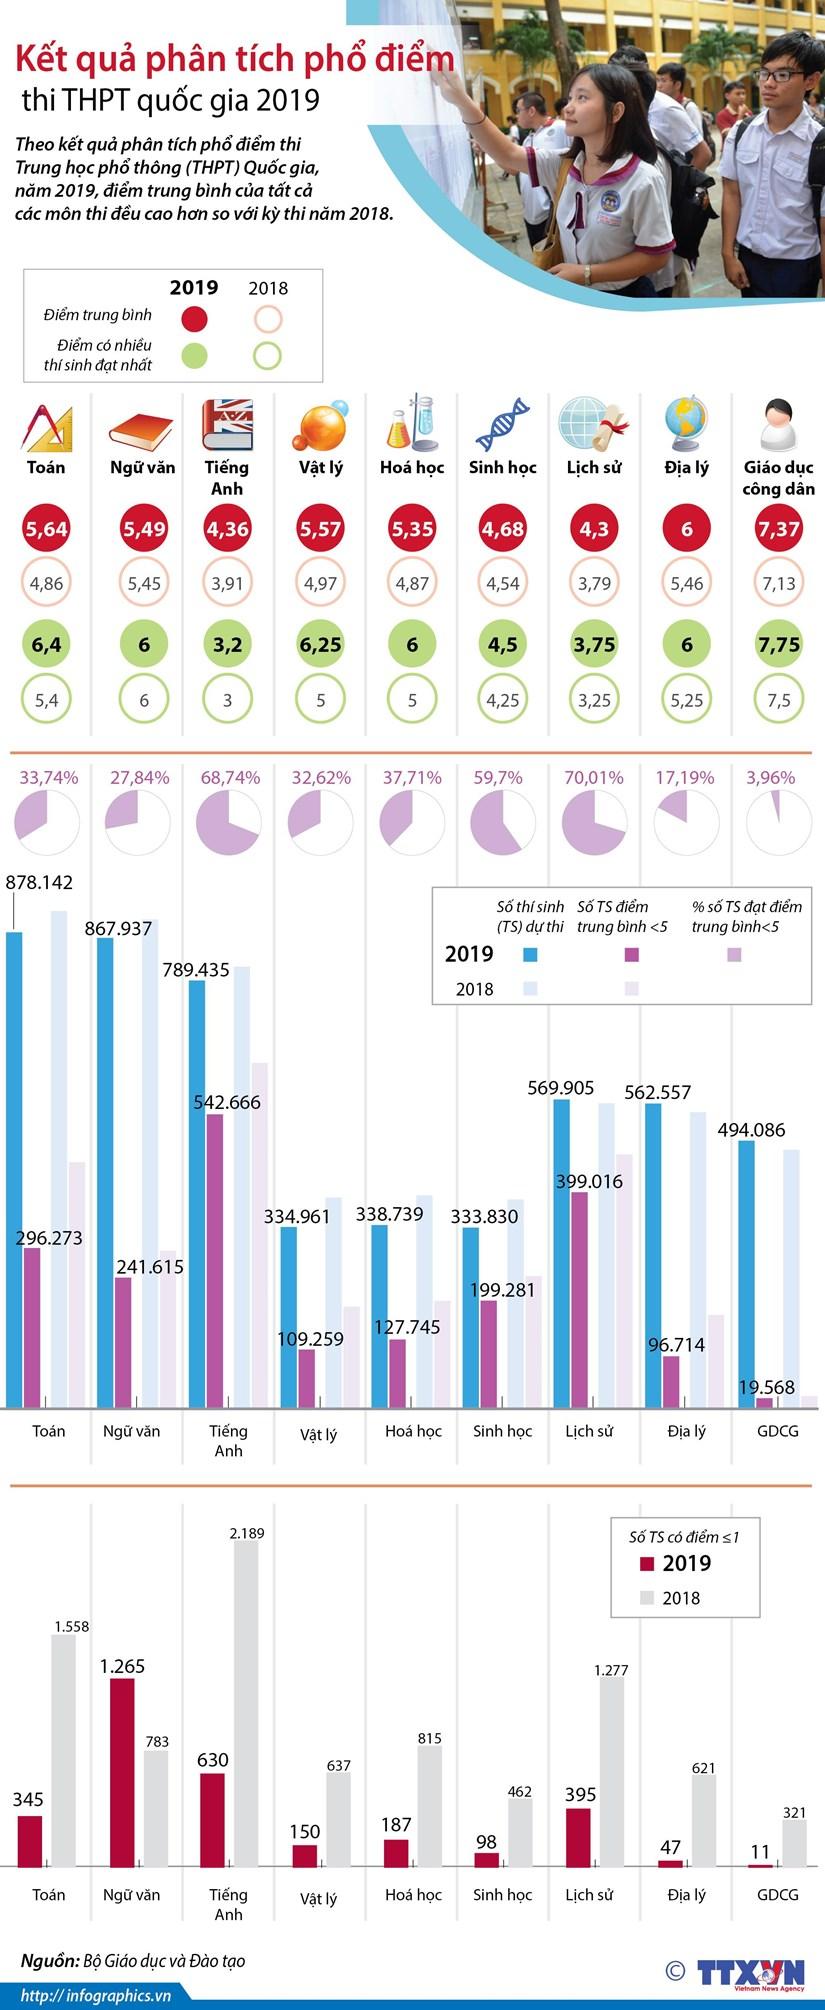 [Infographics] Ket qua phan tich pho diem thi THPT Quoc gia 2019 hinh anh 1